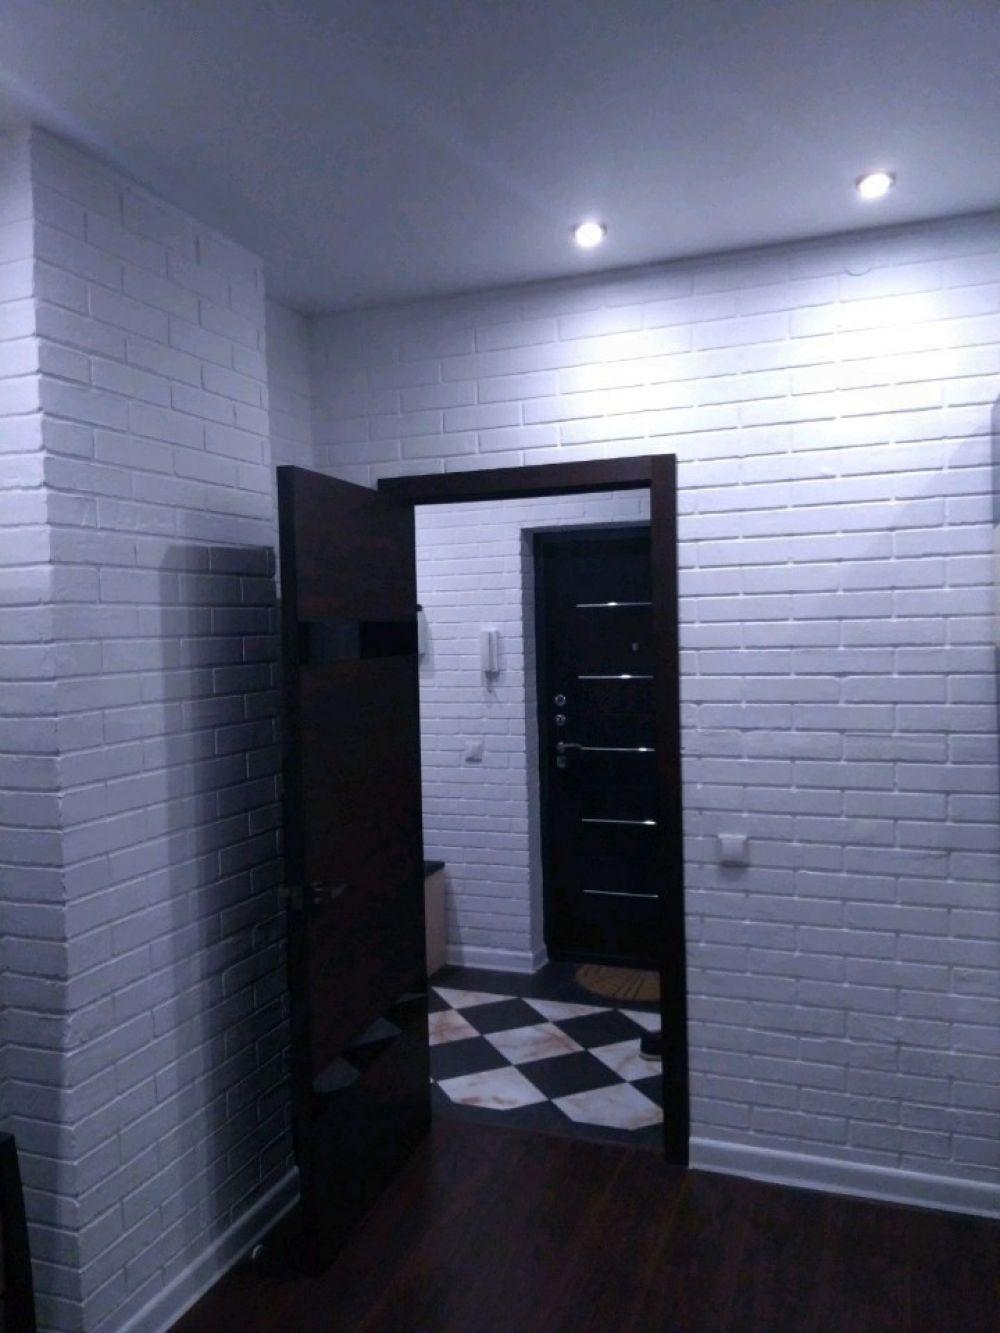 1-к квартира, Щелково, микрорайон Богородский, 3, фото 3